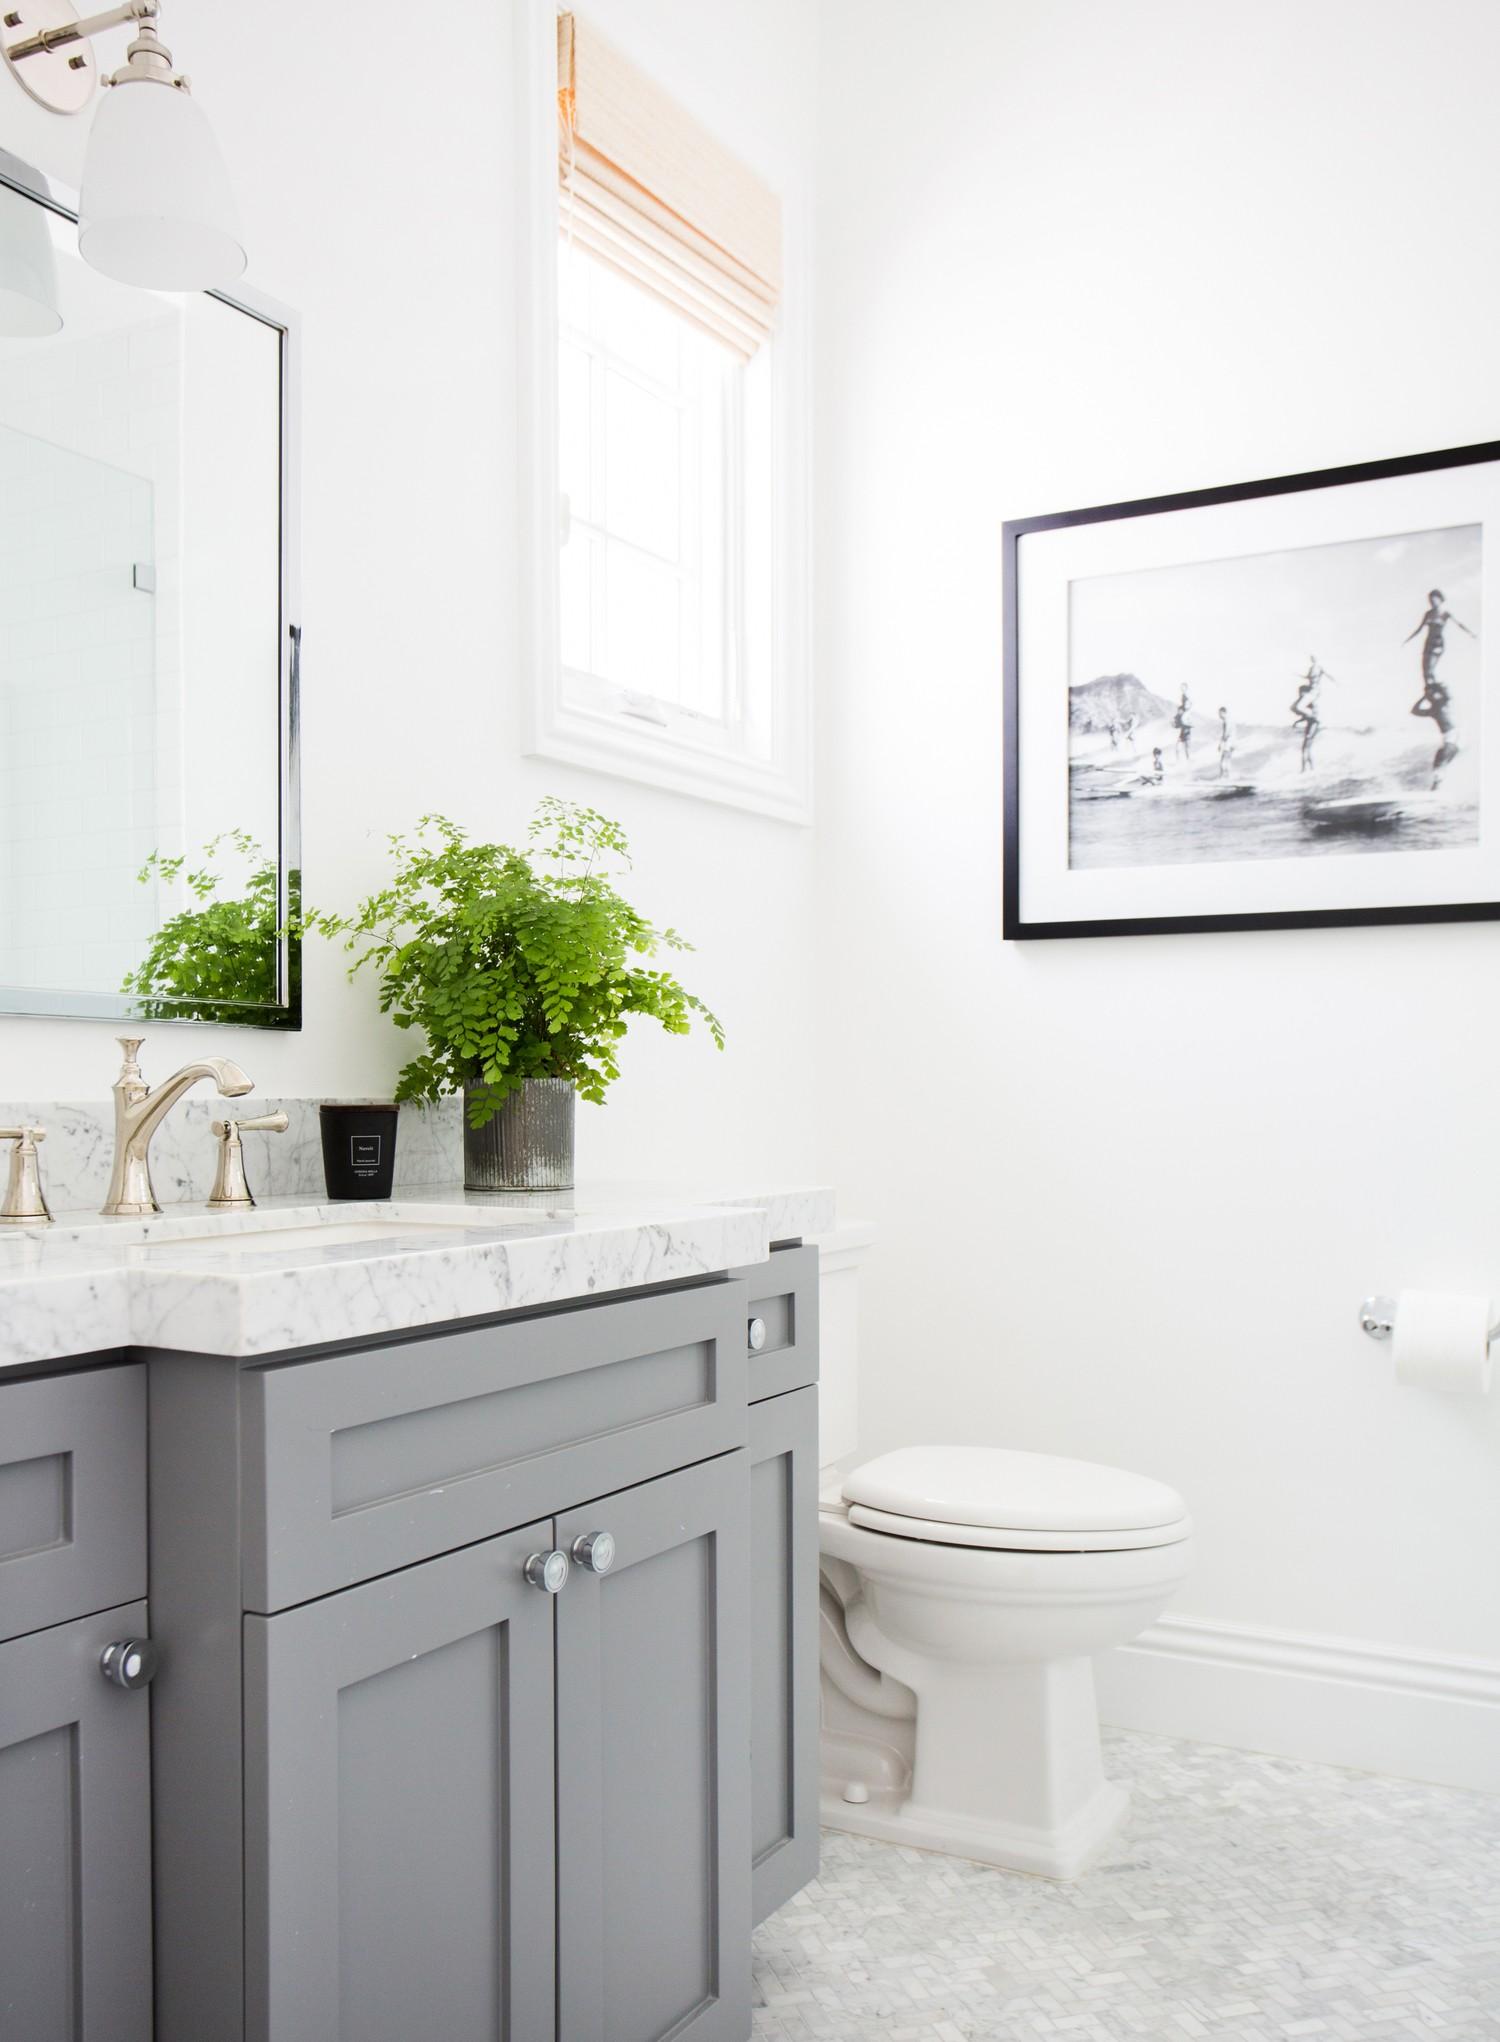 Bathroom with Benjamin Moore 'Chelsea Gray' vanity and B/W artwork || Studio McGee